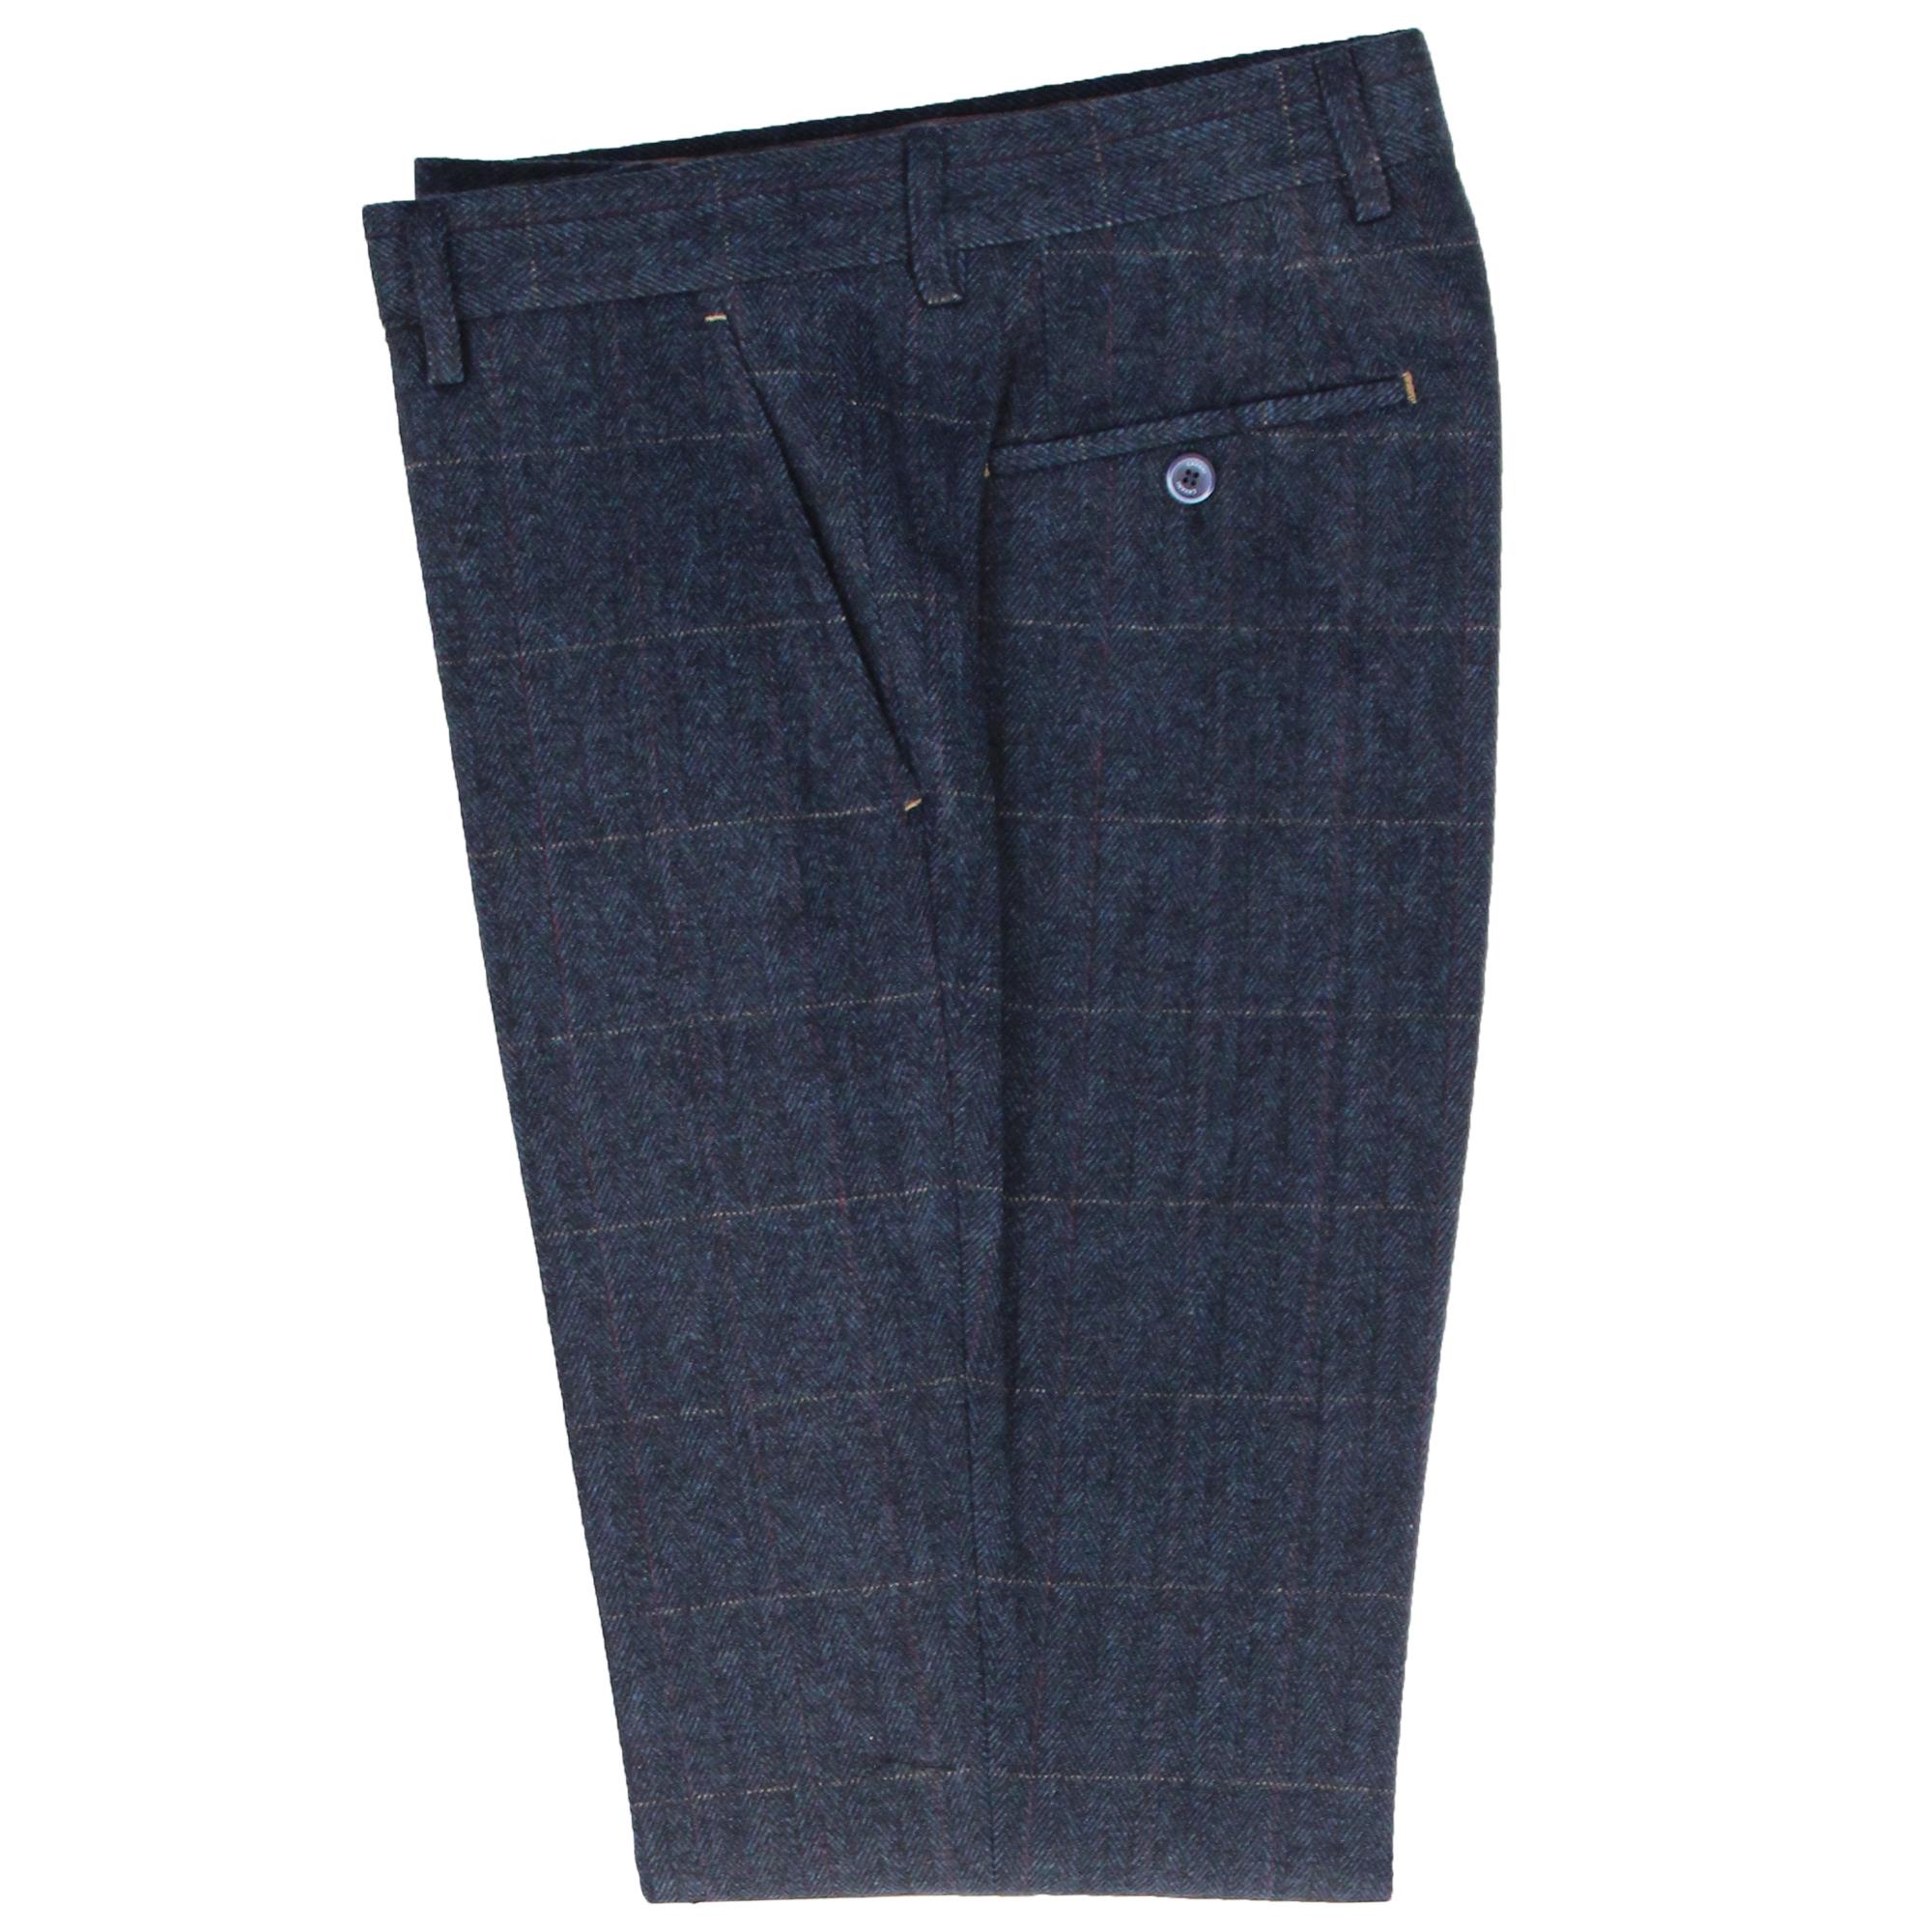 Mens-Wool-Mix-3-Piece-Tweed-Suit-Cavani-CARNEGI-Checked-Peaky-Blinders-Party-New thumbnail 5